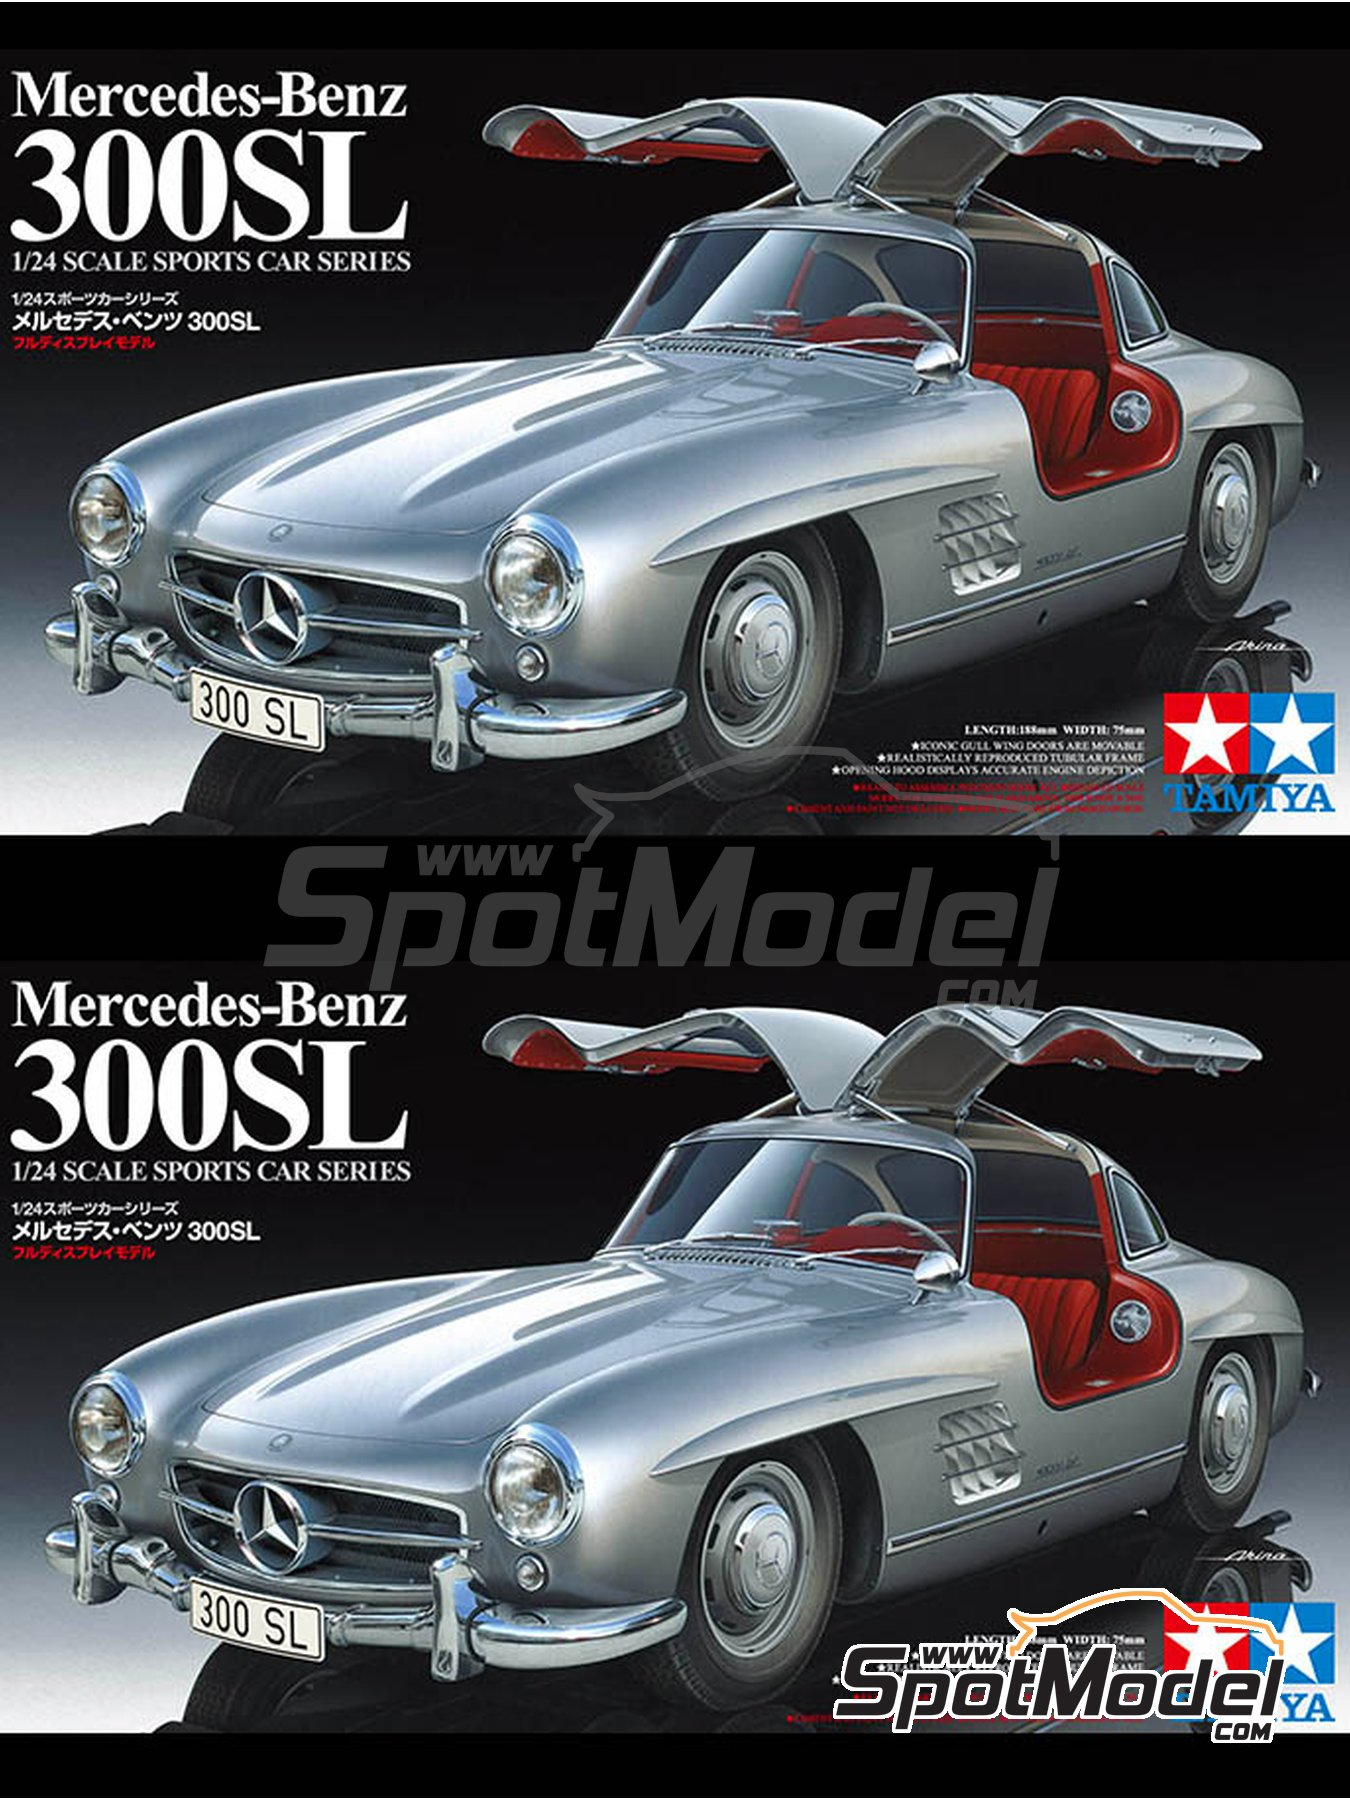 Tamiya model car kit 1 24 scale mercedes benz 300sl for Mercedes benz scale model cars